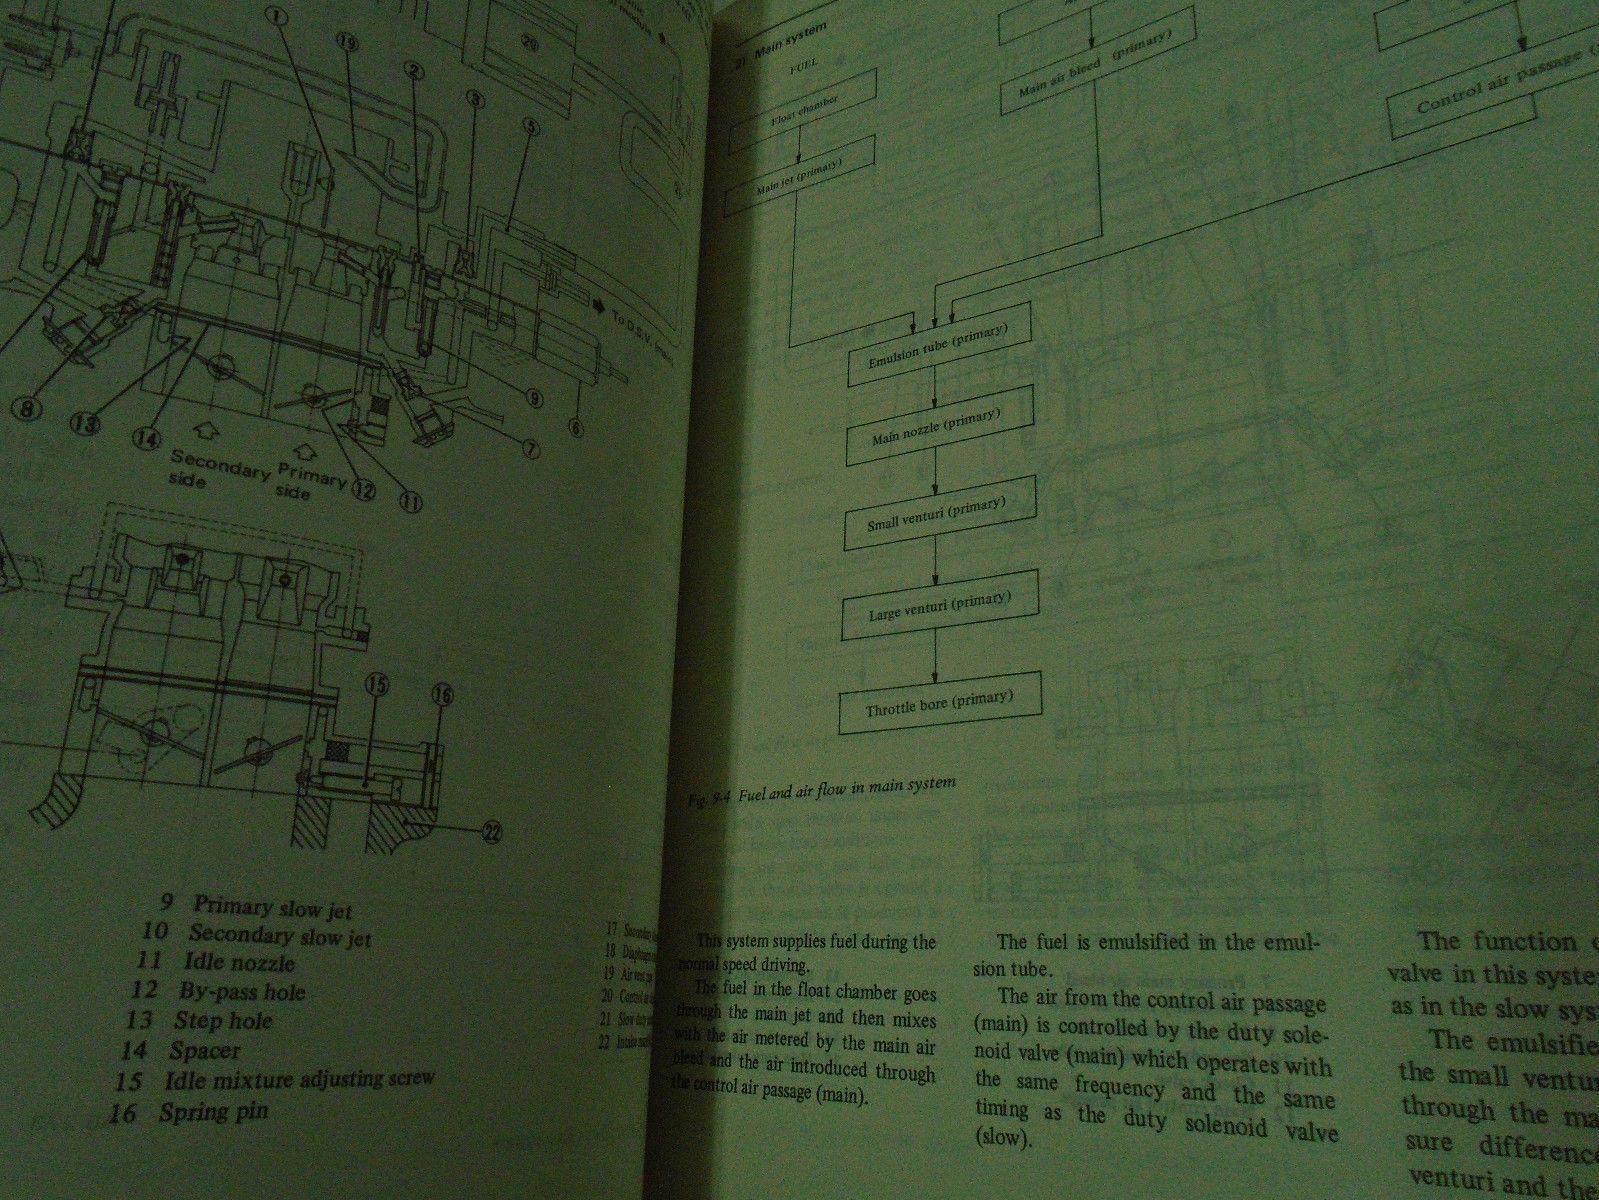 1982 Subaru 1600 1800 Service Repair Shop Manual Set FACTORY OEM BOOKS Damaged